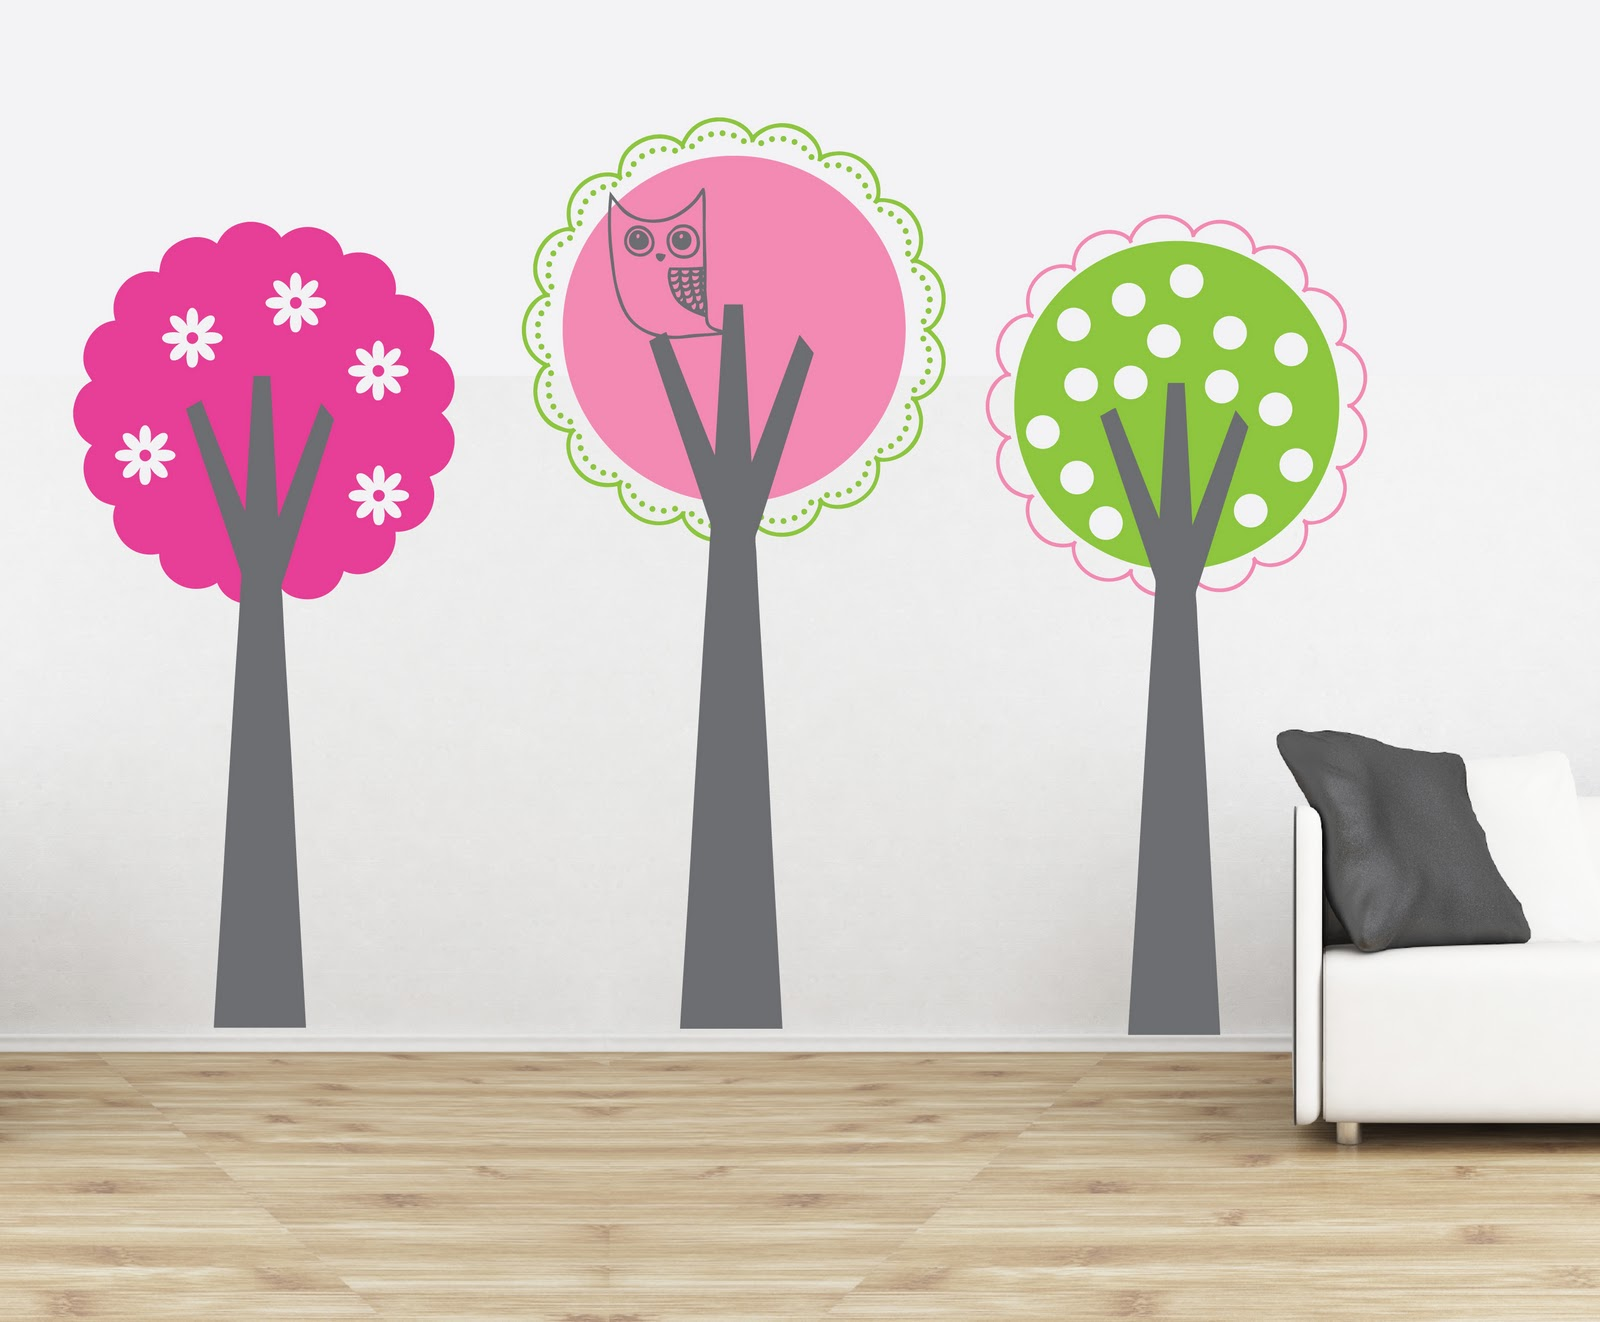 http://3.bp.blogspot.com/-kF5g1v3xlGw/Tswxj_CfblI/AAAAAAAADak/DWXfMF2U7TM/s1600/CT144+-+Cute+Modern+Trees+-+3+Setb.jpg